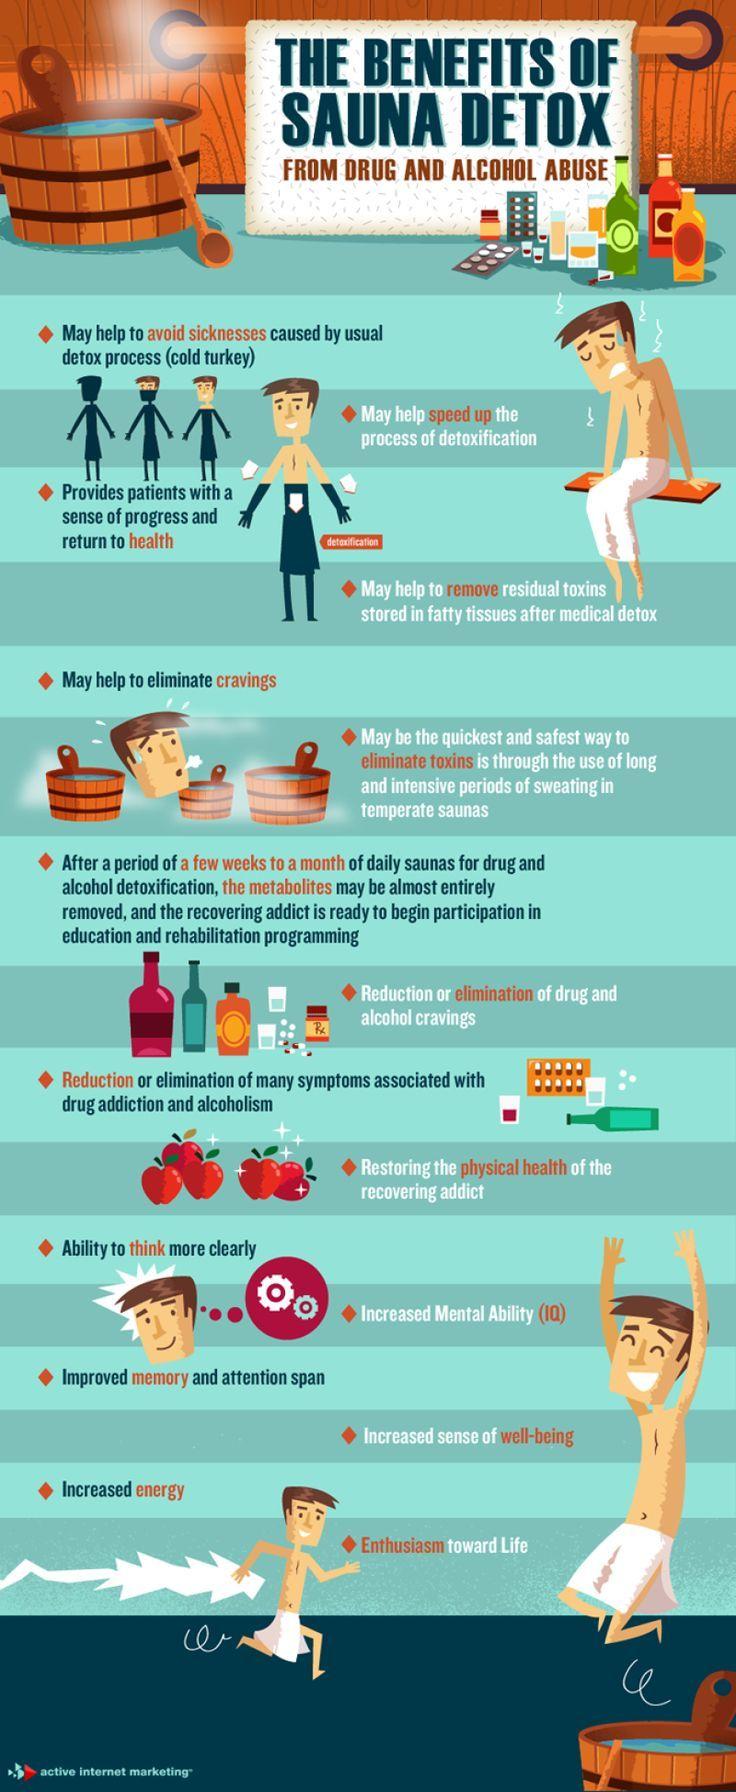 Benefits of Sauna Detox